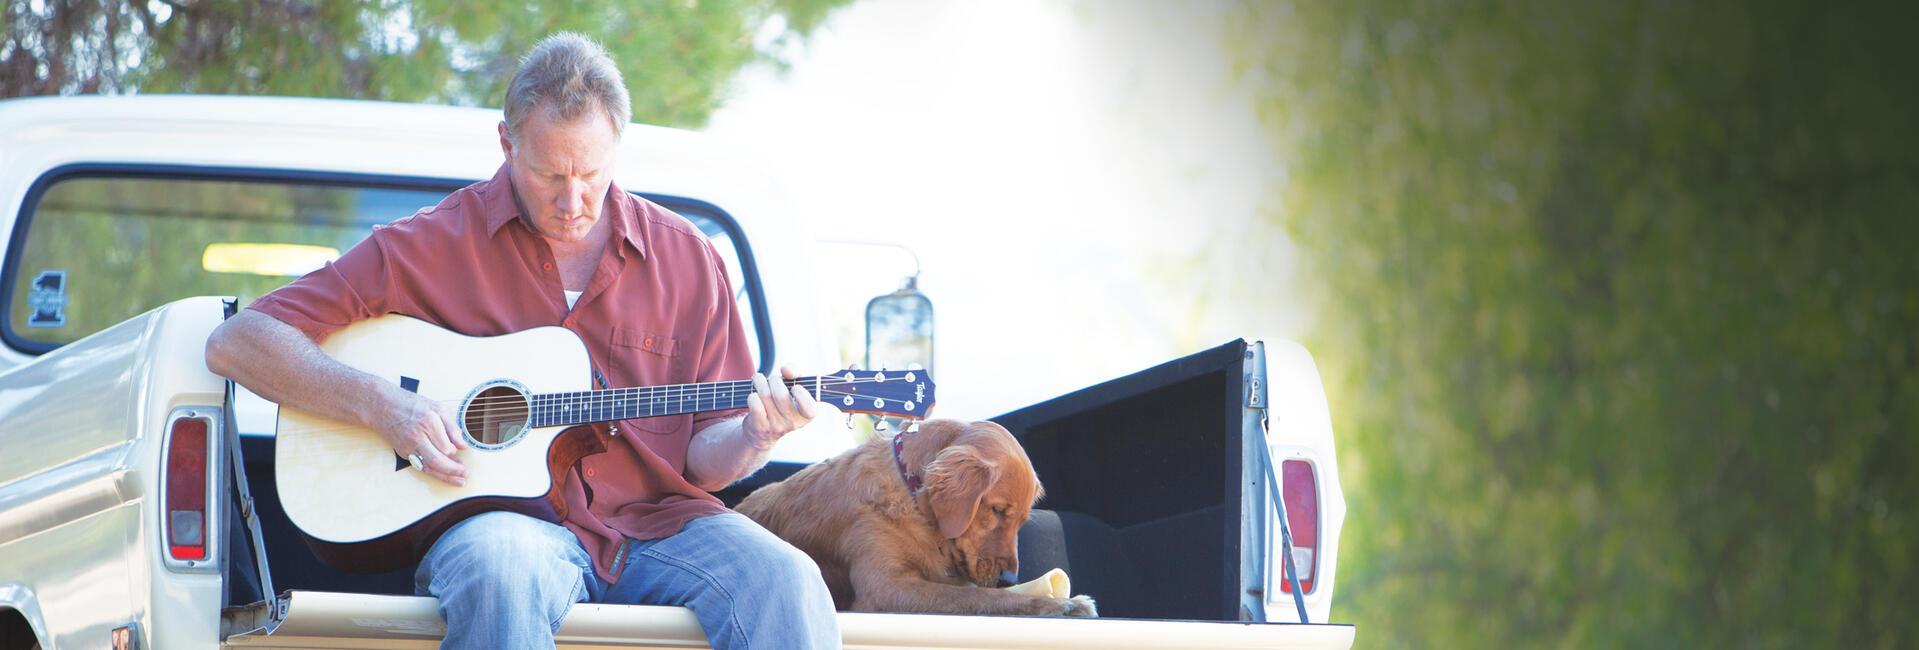 Guitar Resources - Taylor Guitar Owner Resource